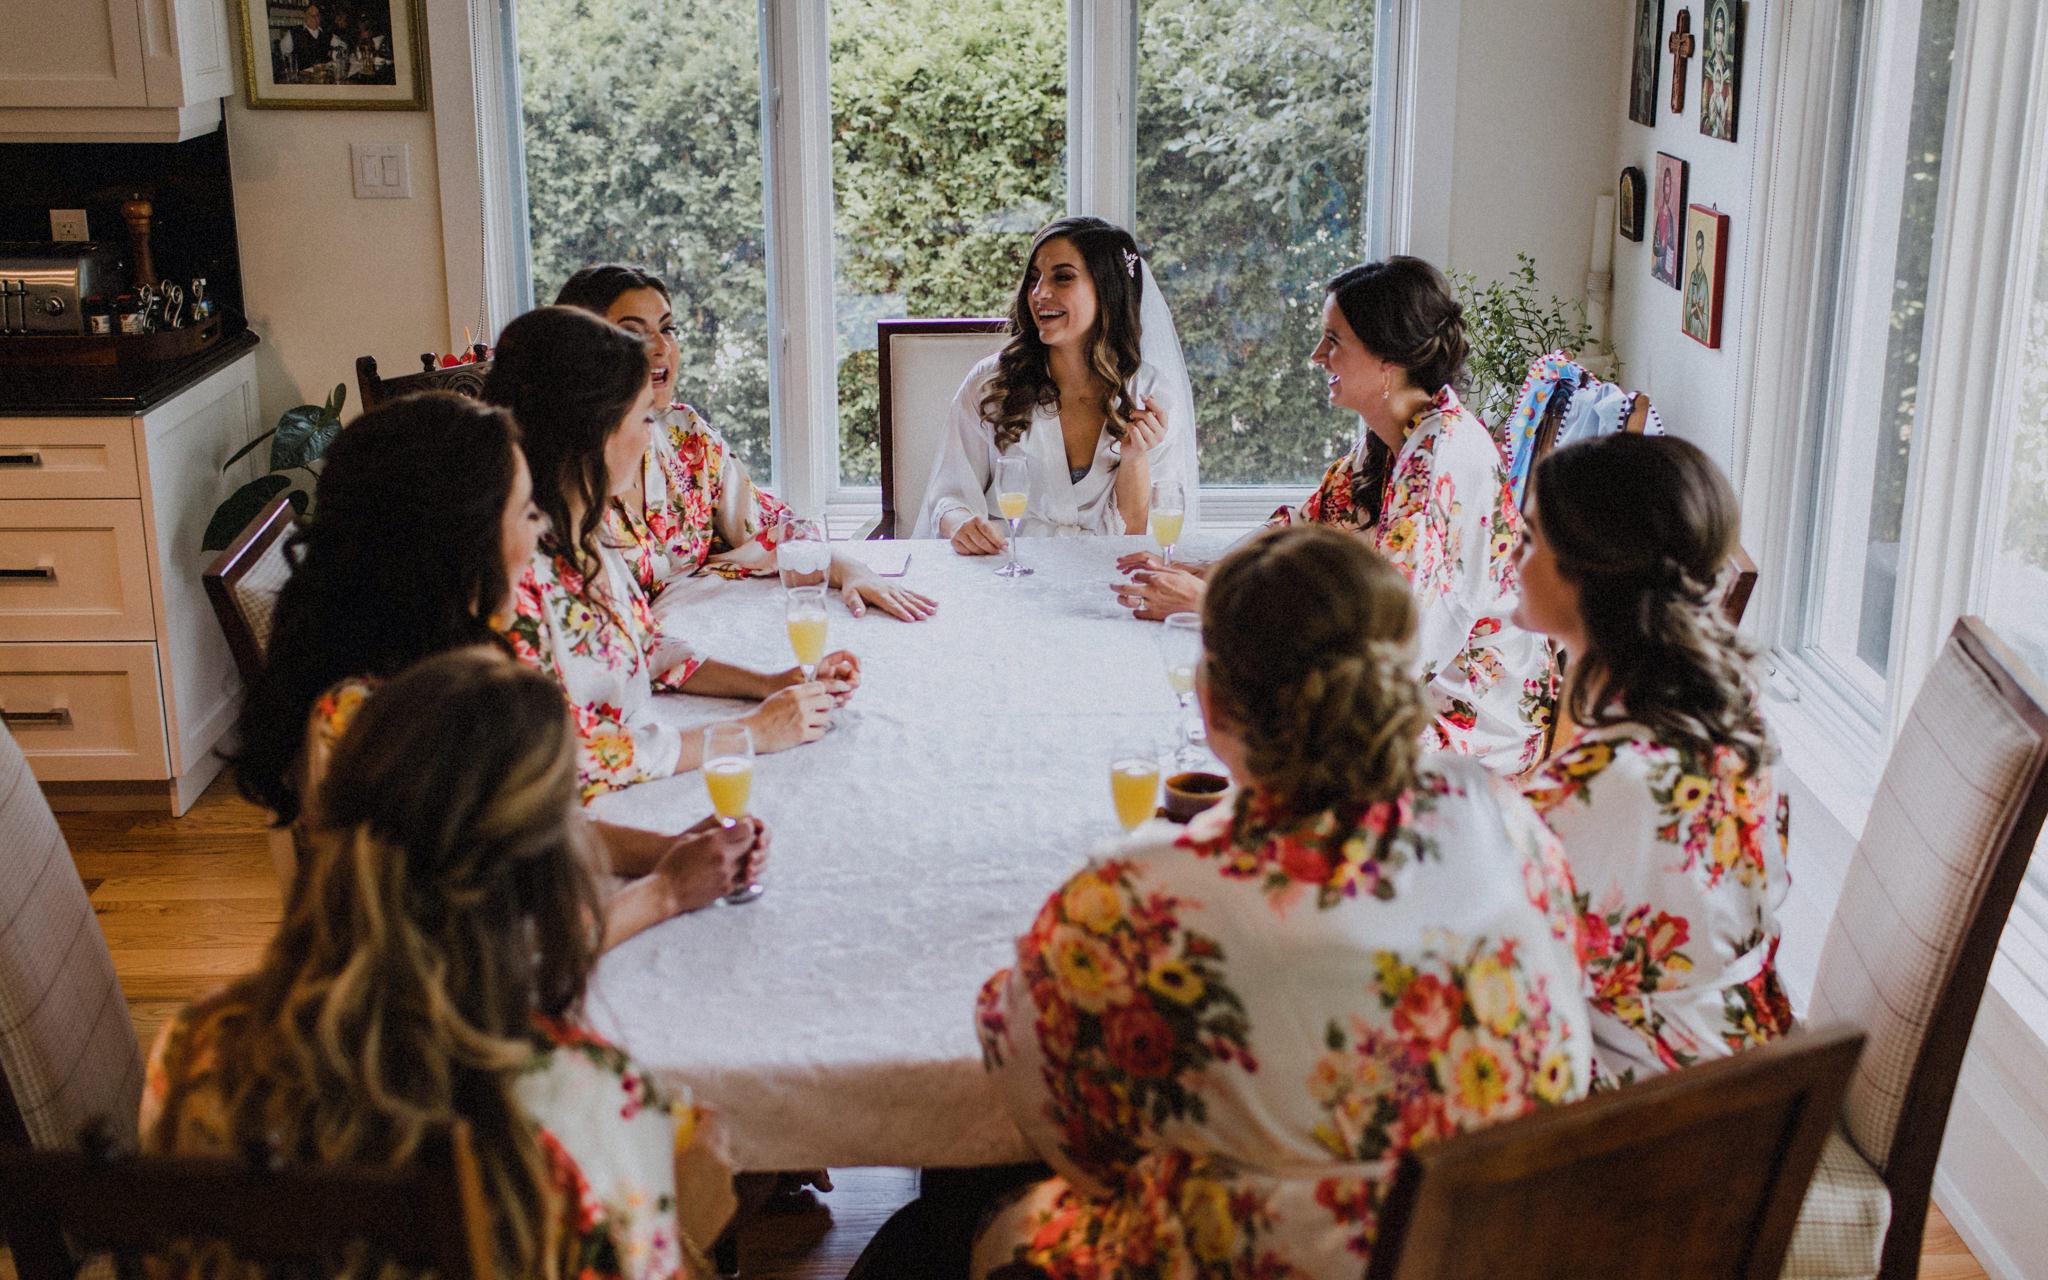 bride and bridesmaids share a mimosa